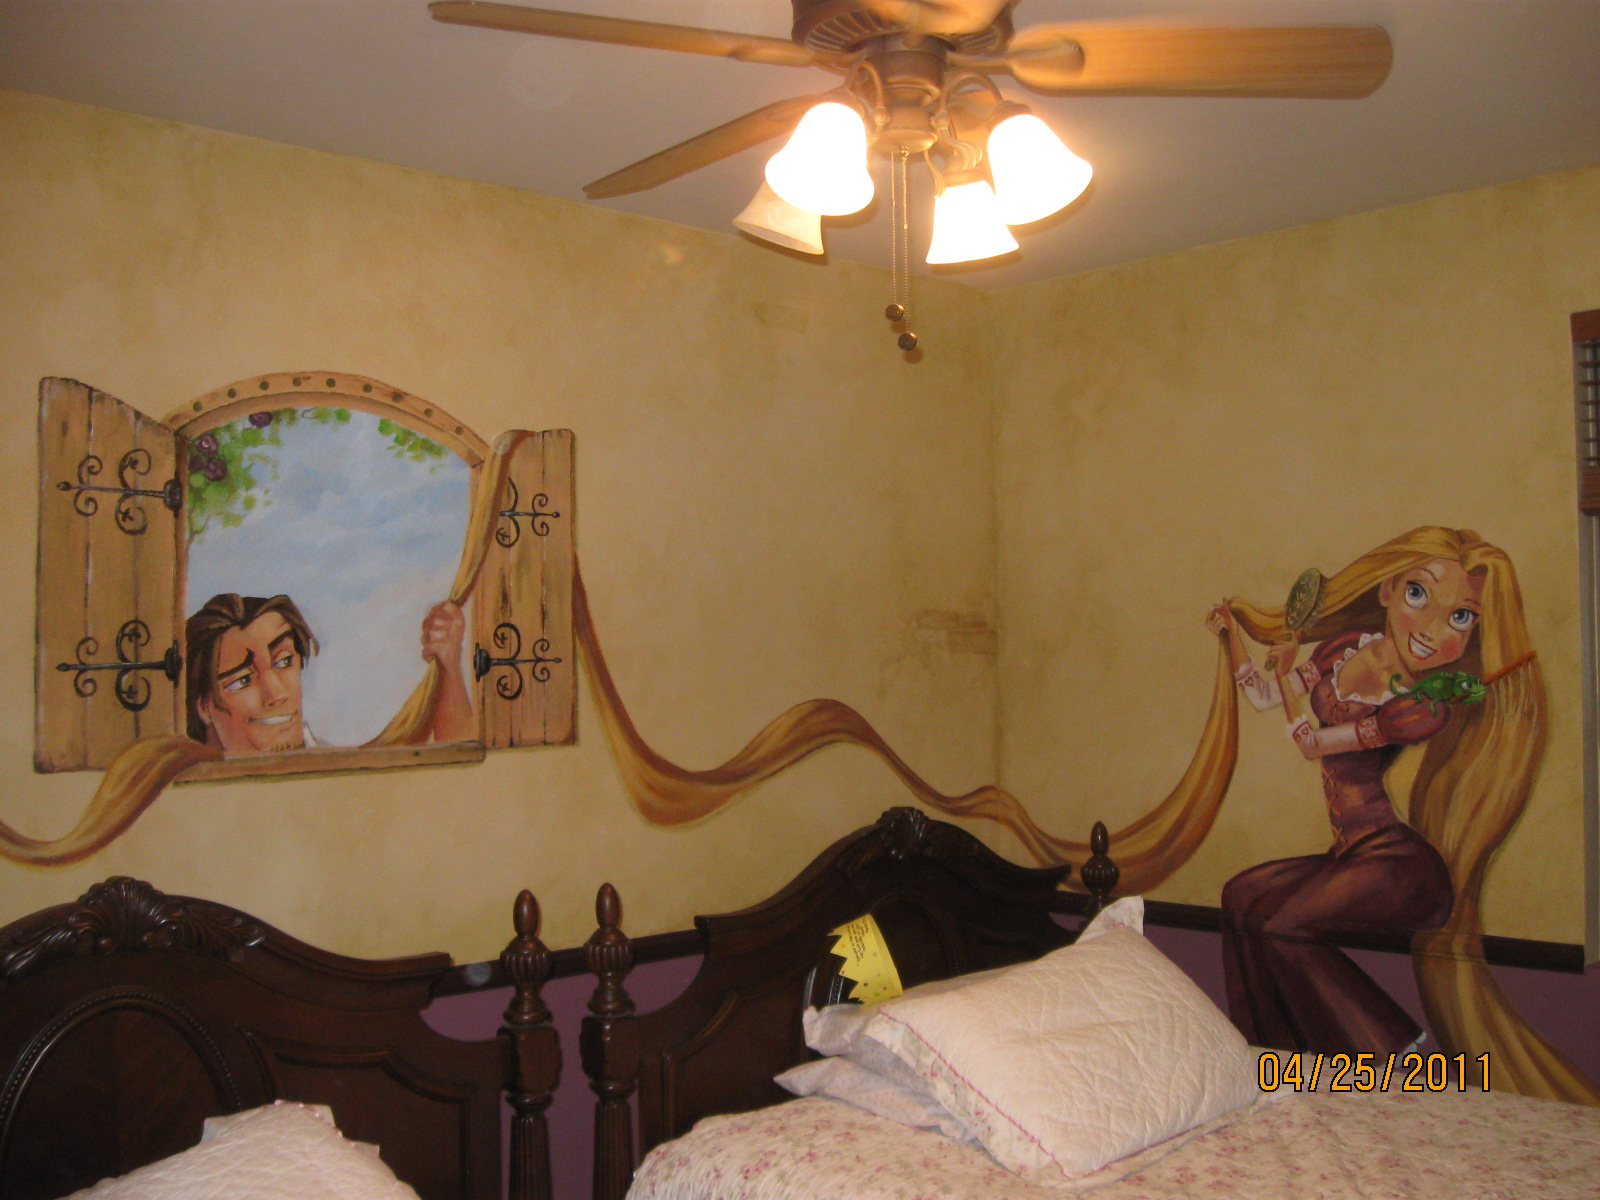 Arizona childrens wall murals i love murals by gina ribaudo for Children wall mural